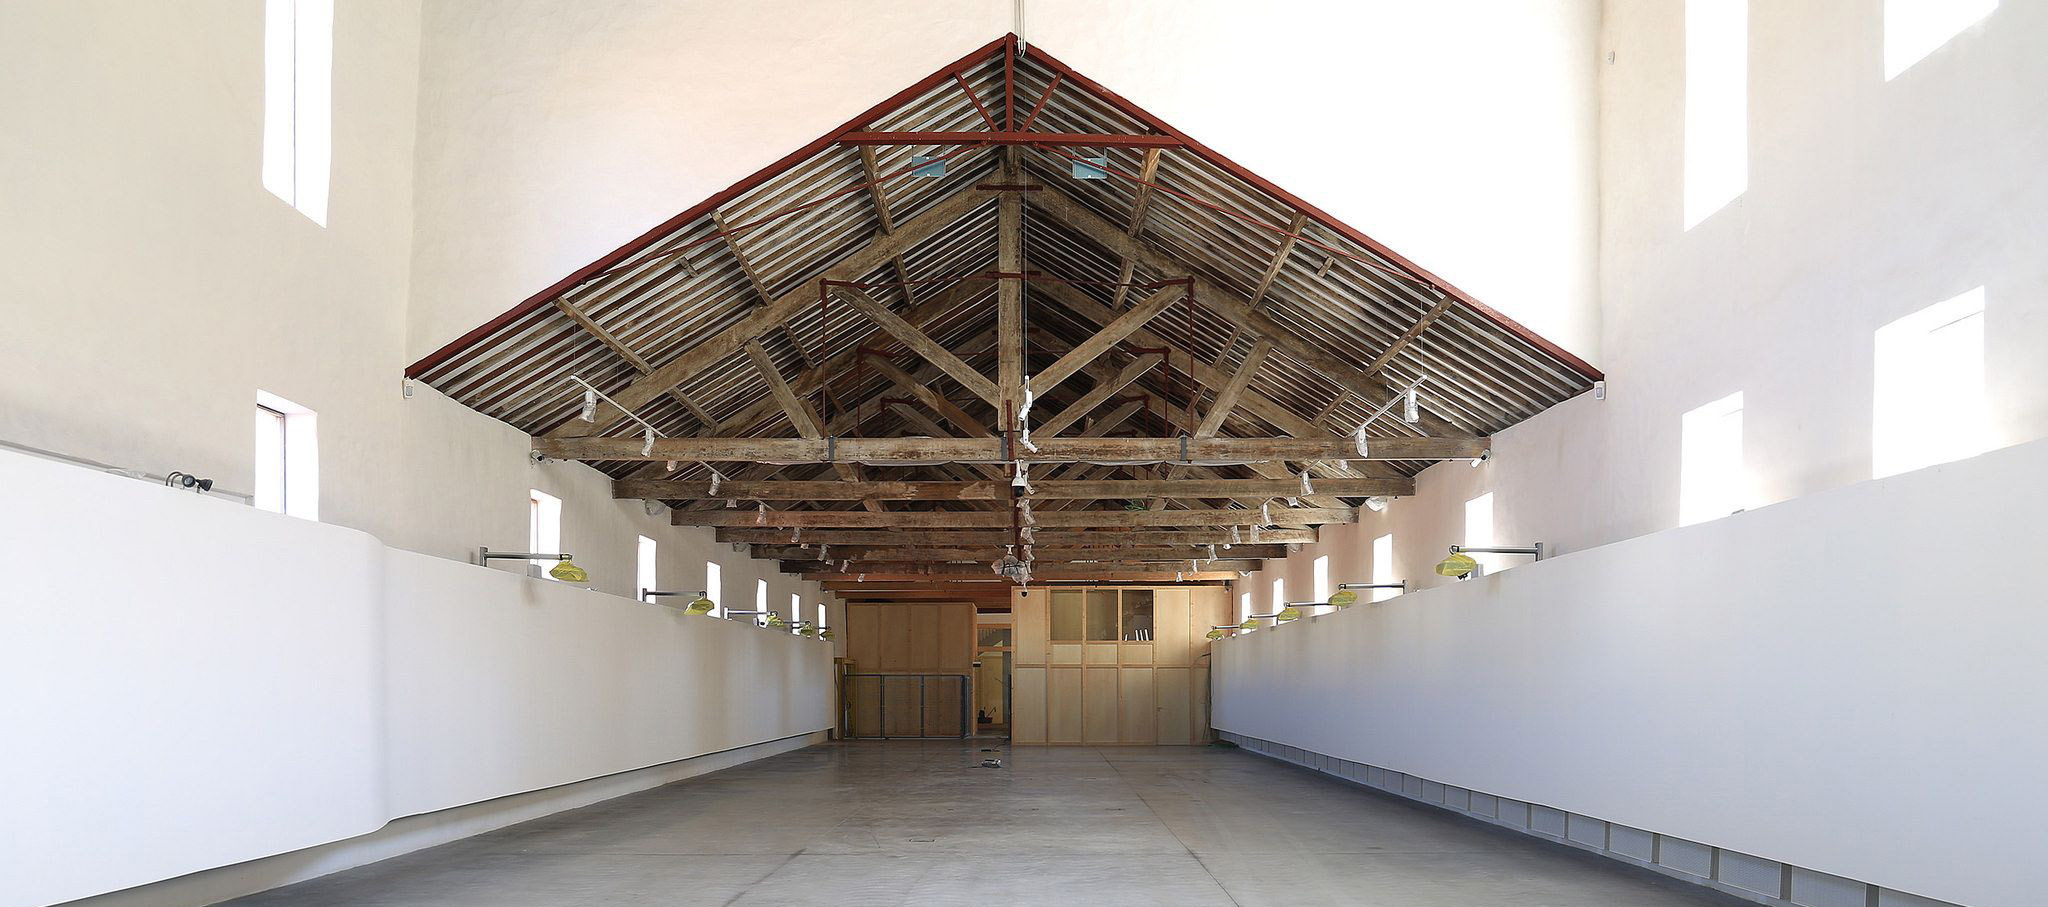 New Real Vinícola facilities by Guilherme Machado Vaz. Image courtesy of © Casa da Arquitectura